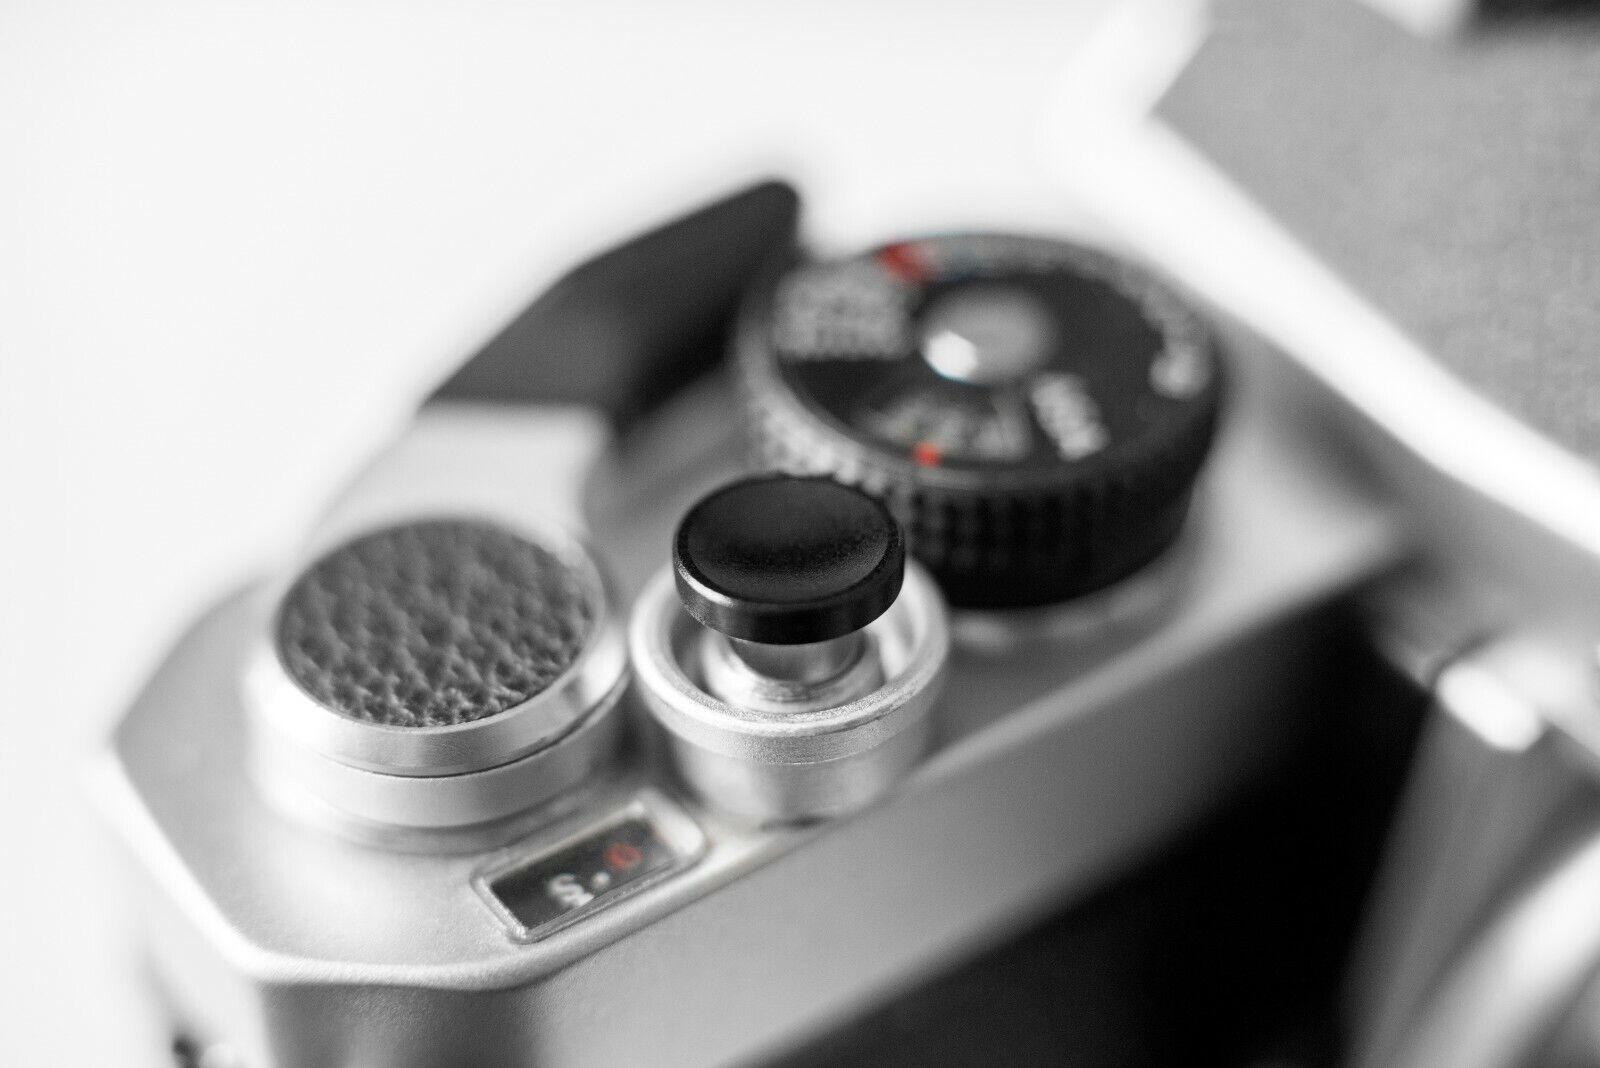 Black Metal Shutter Button Soft Release Metal Concave - Fuji XT2 X20 X100 etc